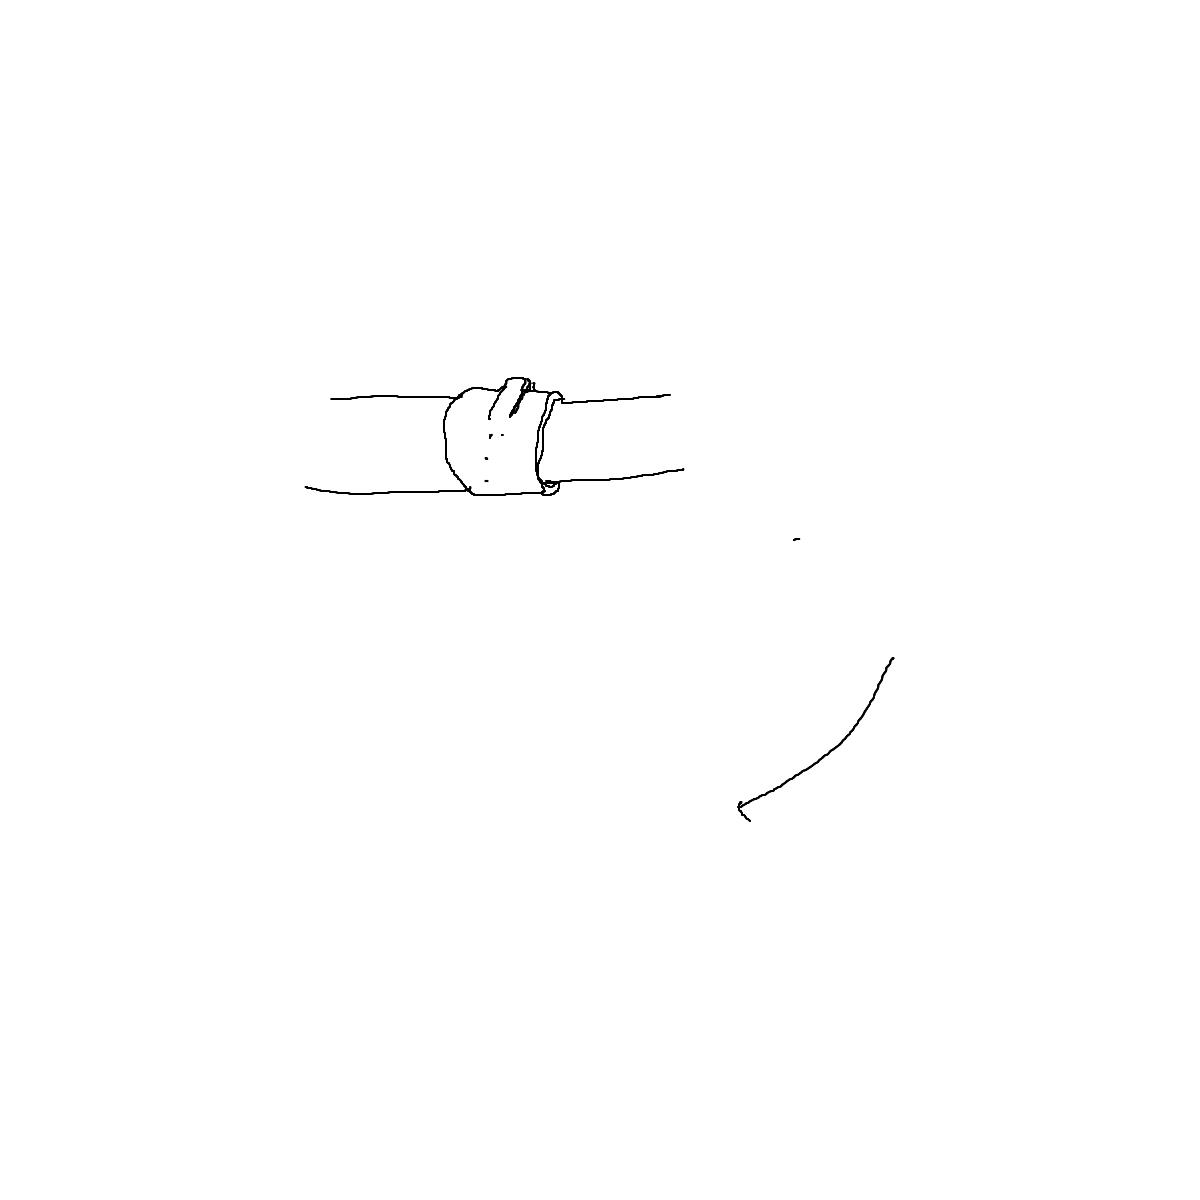 BAAAM drawing#22108 lat:78.4174575805664000lng: -4.4292416572570800